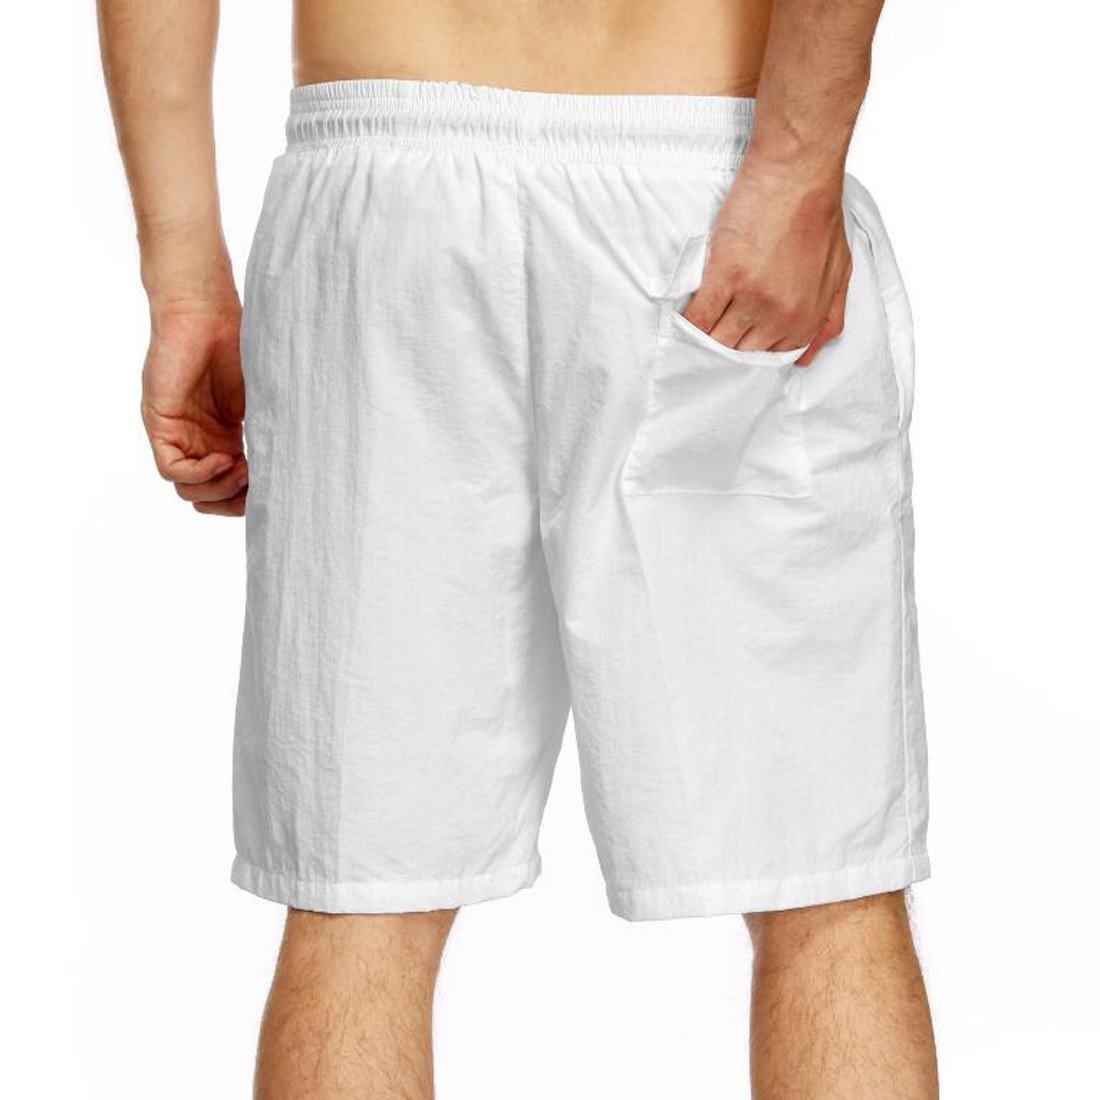 76116cd535d1a3 Badeshorts Herren Jersey Short mit Taschen Loose Beach Board Swim Shorts Badehose  weiß XL E3130S0047 Sportbekleidung